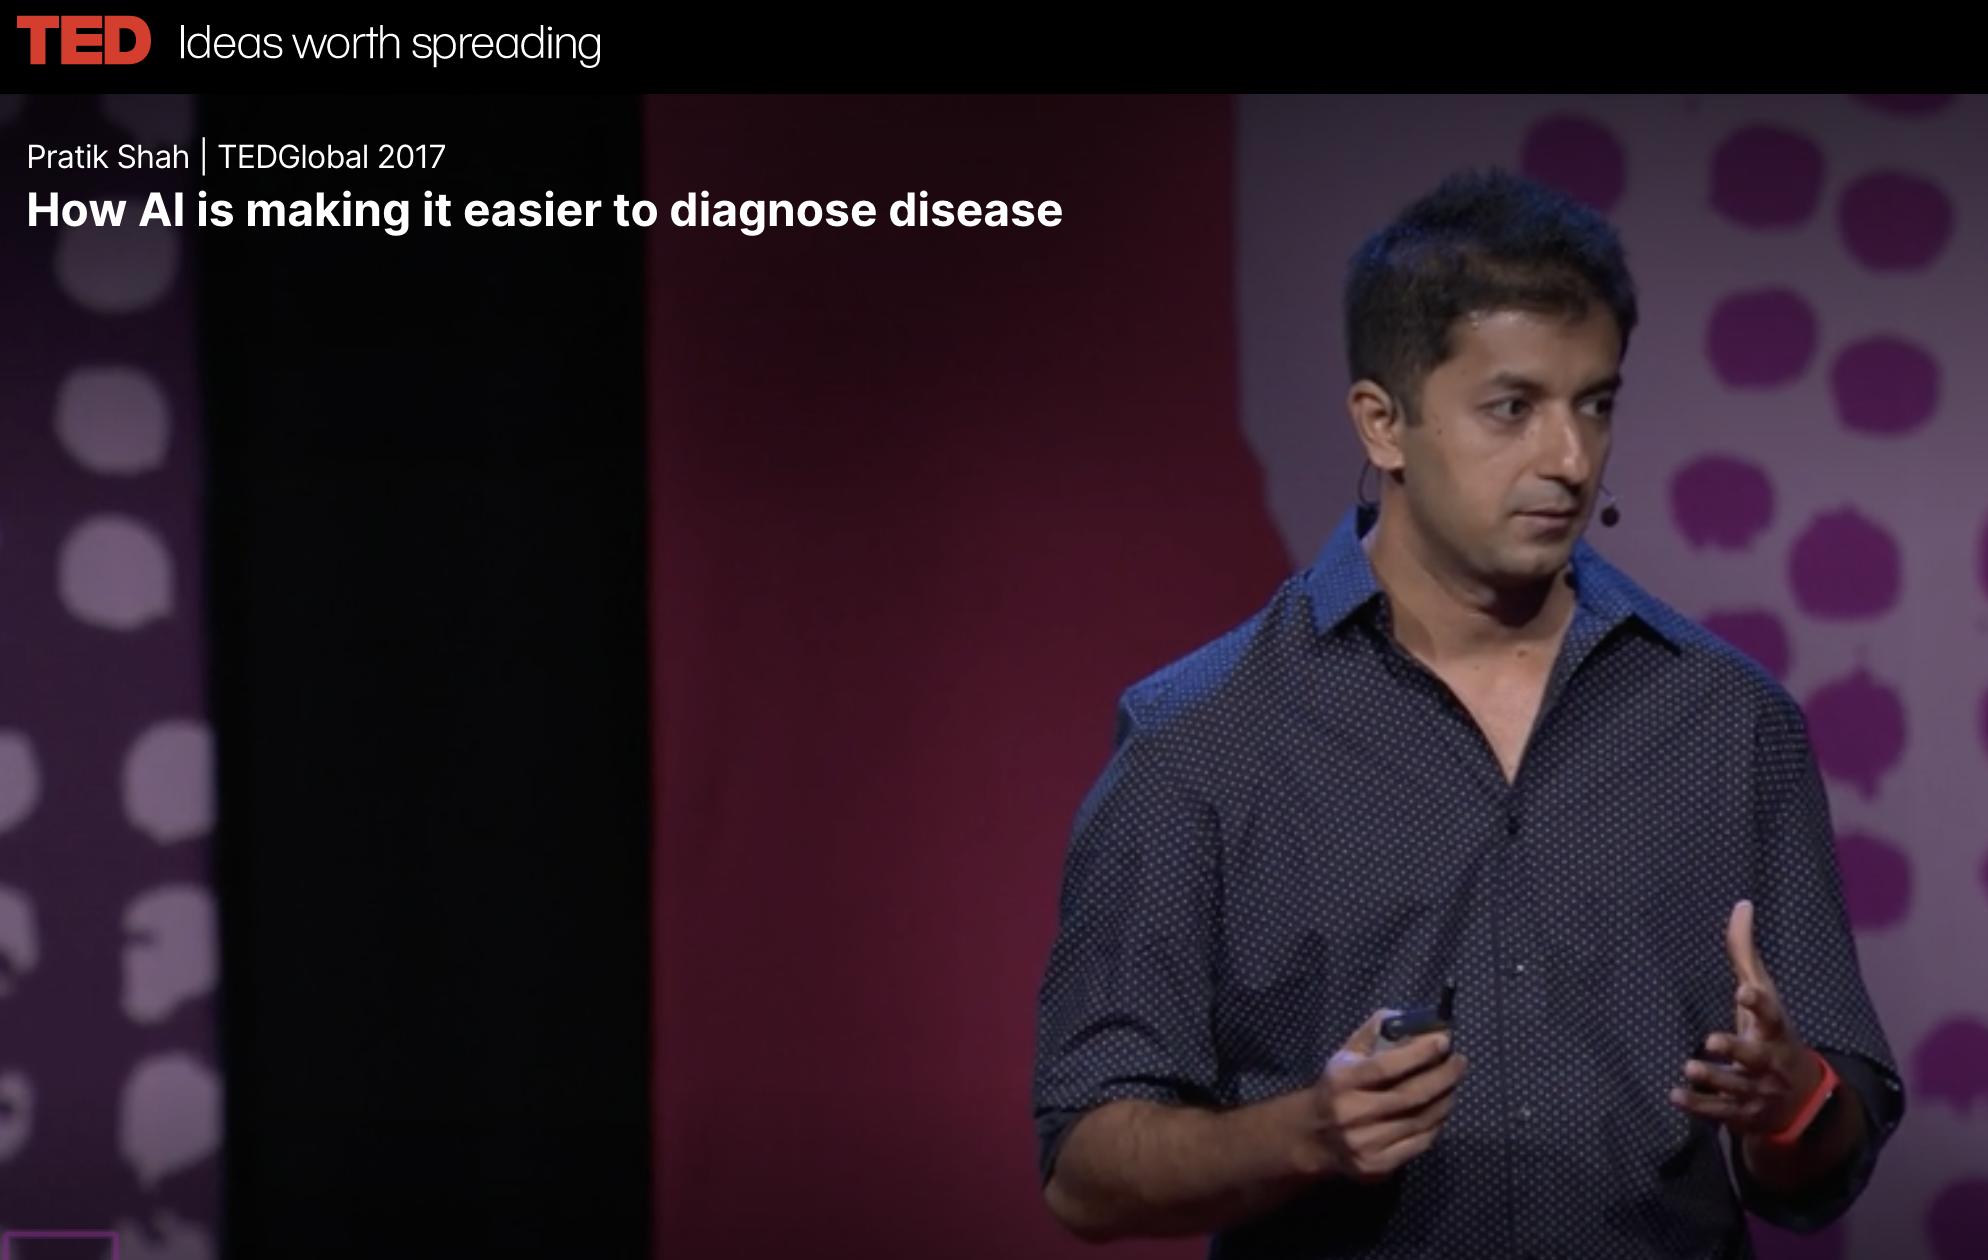 TED 医療英会話 AIが病気の診断を簡単にする方法(04:59) プラティック・シャー(Pratik Shah)